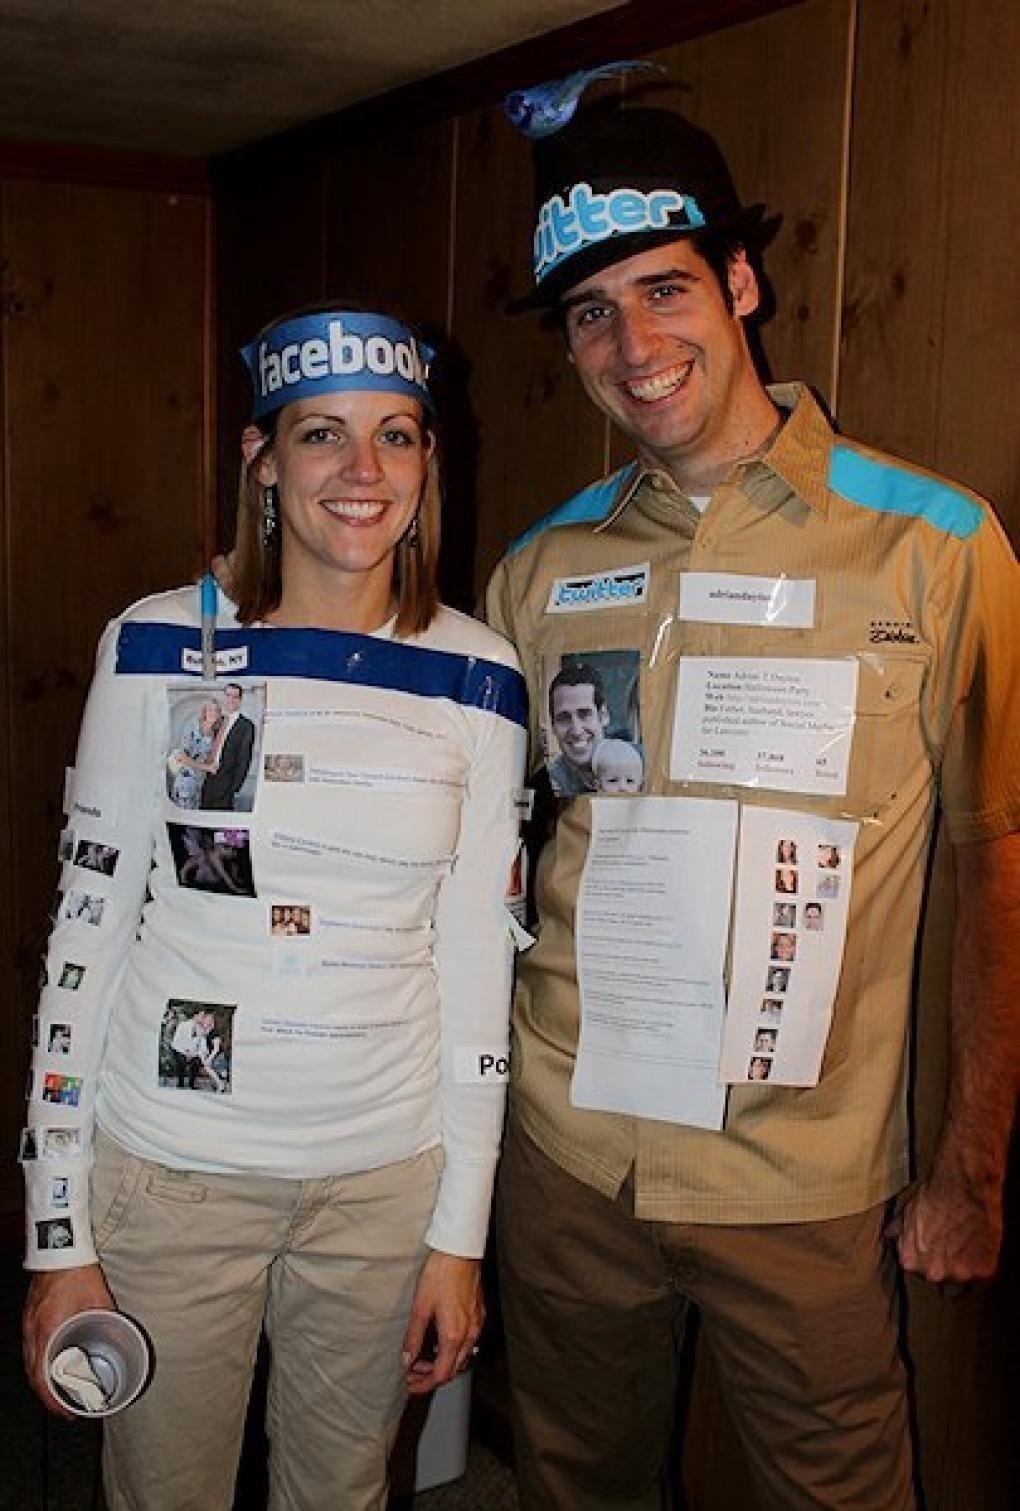 10 Wonderful Funny Couple Halloween Costumes Ideas halloween 2014 facebook et twitter on like duo meltystyle 1 2020